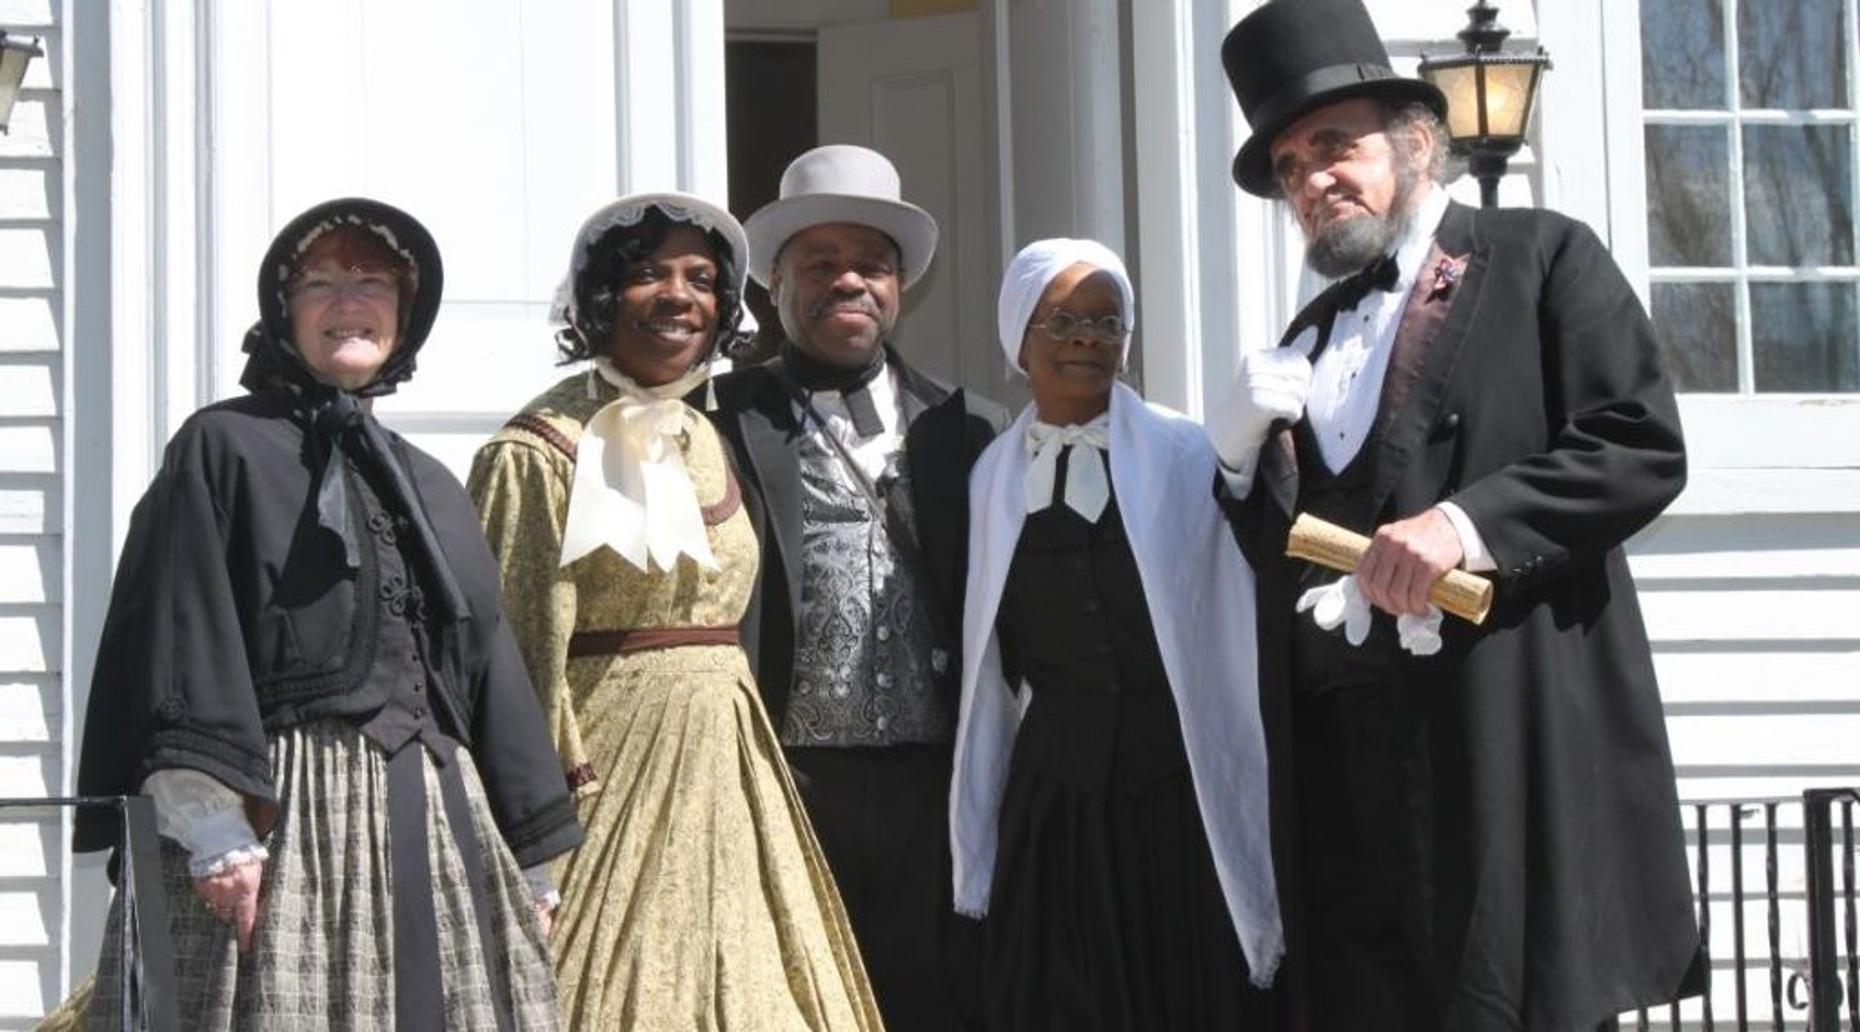 Underground Railroad Freedom Seekers Tour of Niagara Falls Canada